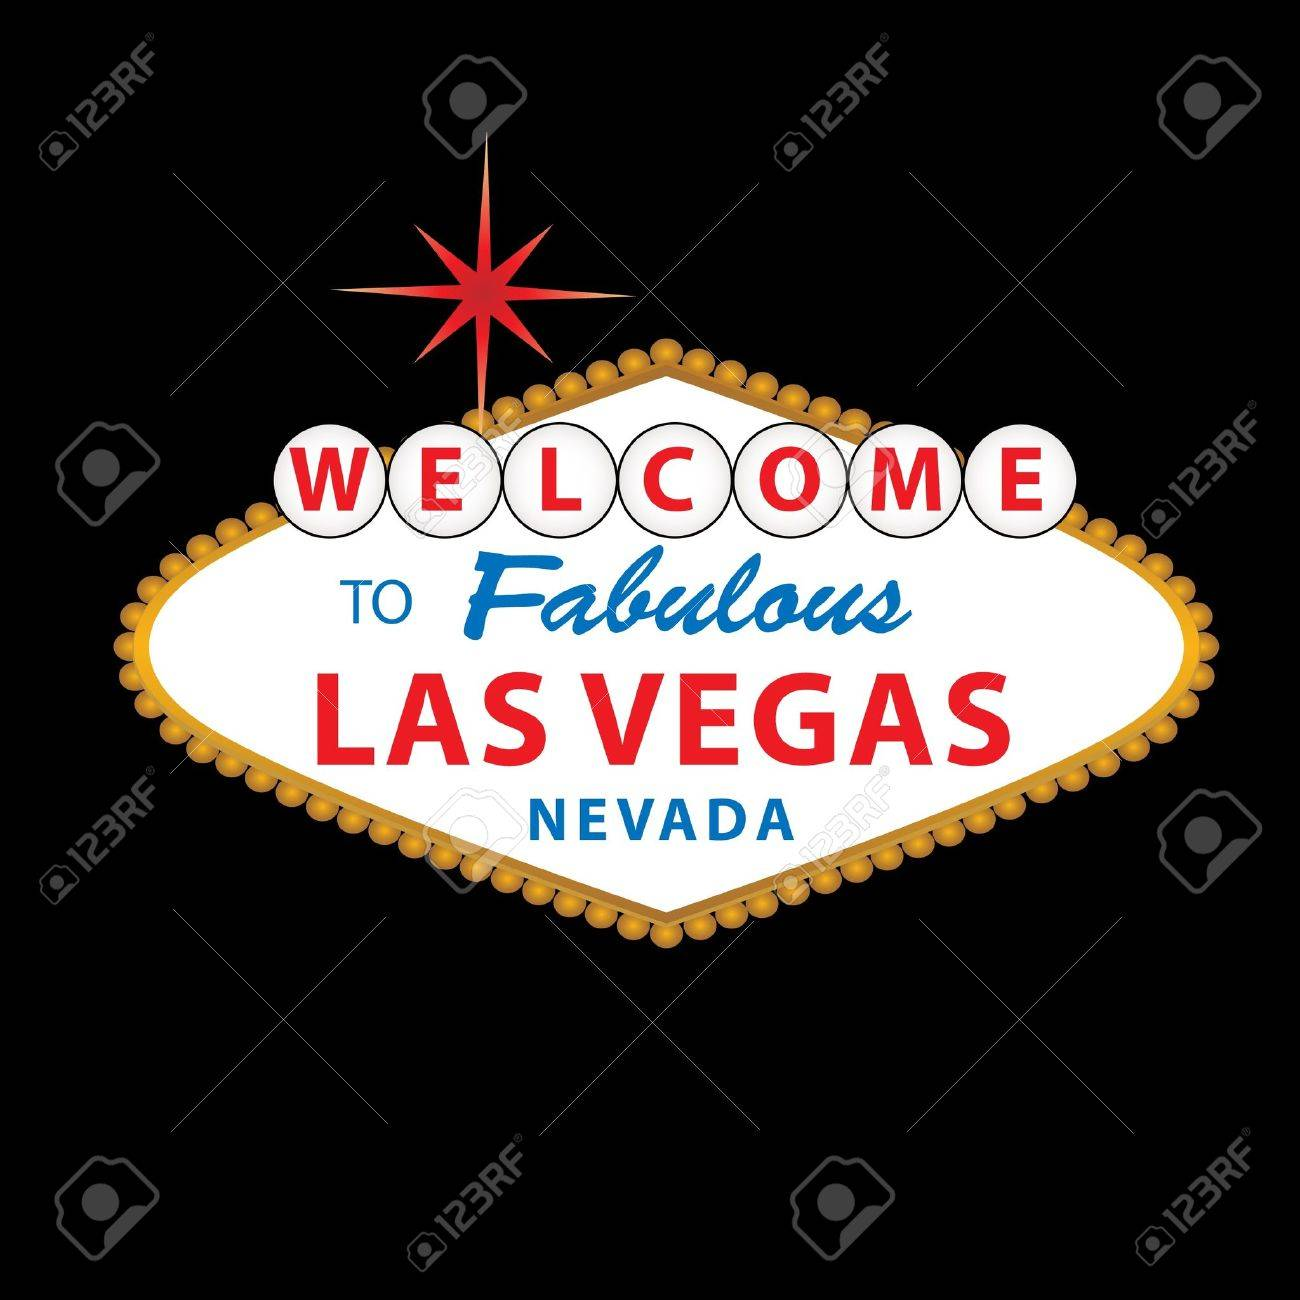 Welcome to Fabulous Las Vegas Nevada sign Stock Photo - 7110525